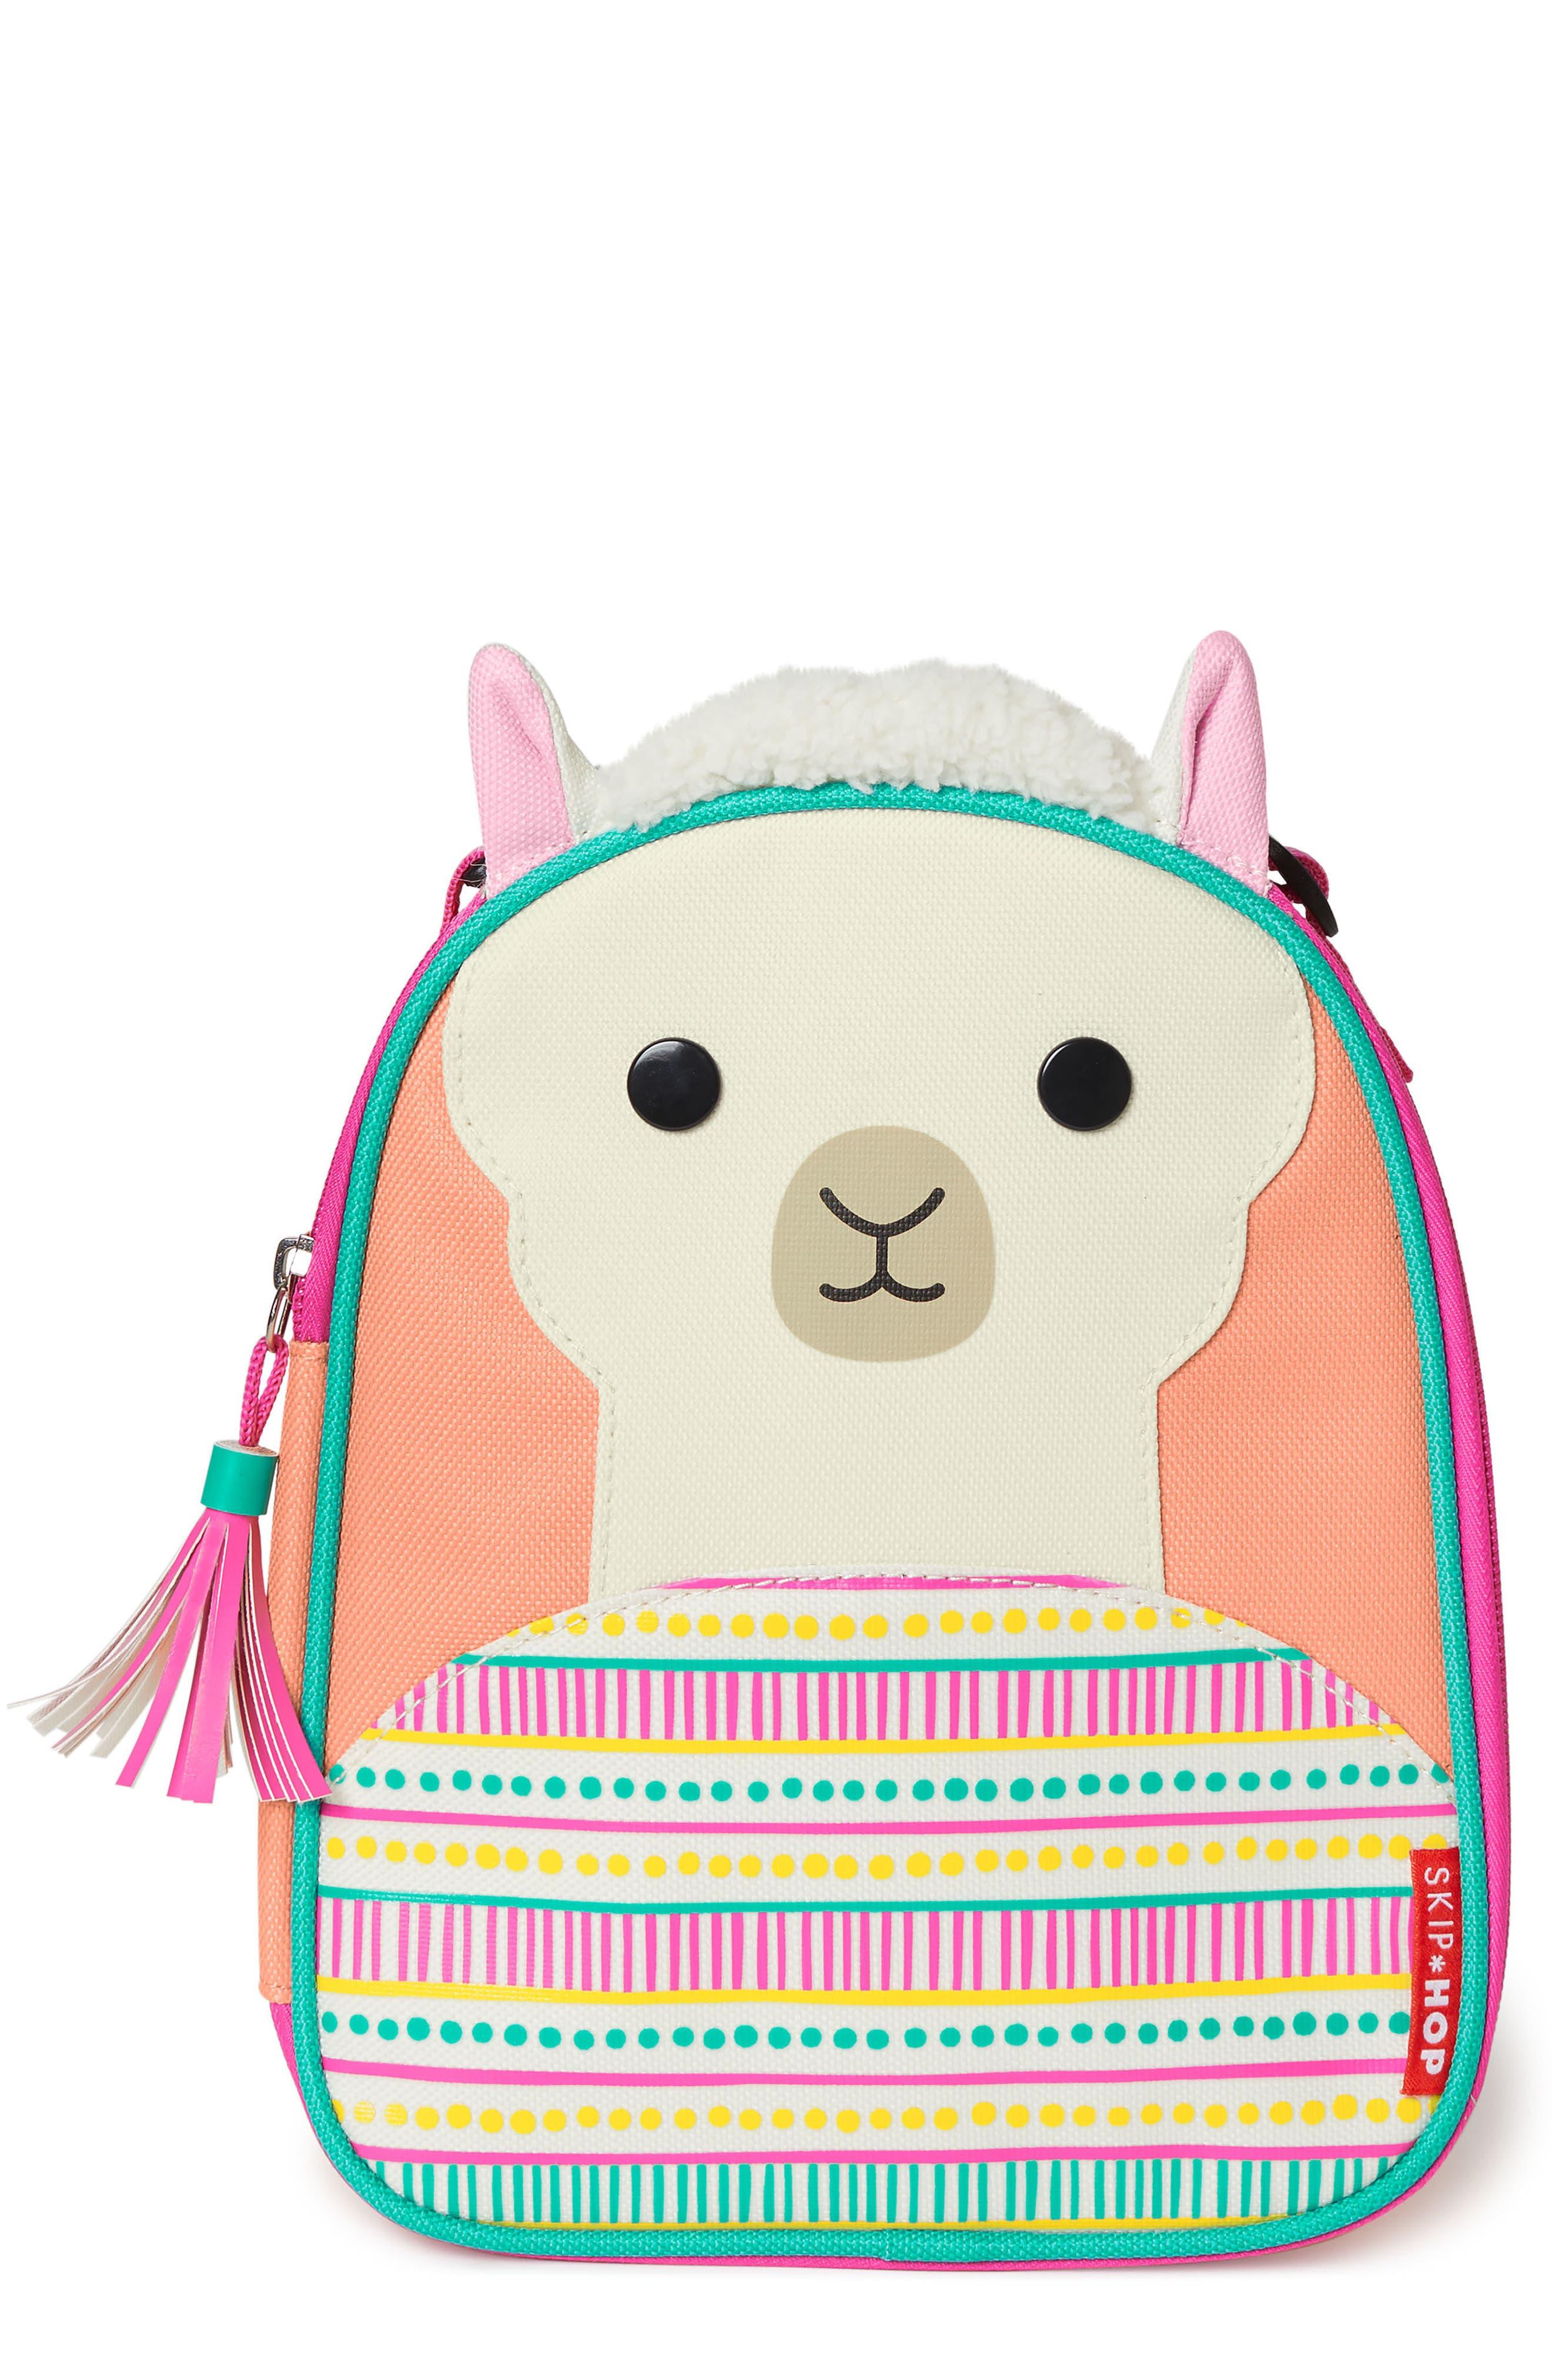 SKIP HOP,                             Insulated Llama Lunch Bag,                             Main thumbnail 1, color,                             PINK MULTI